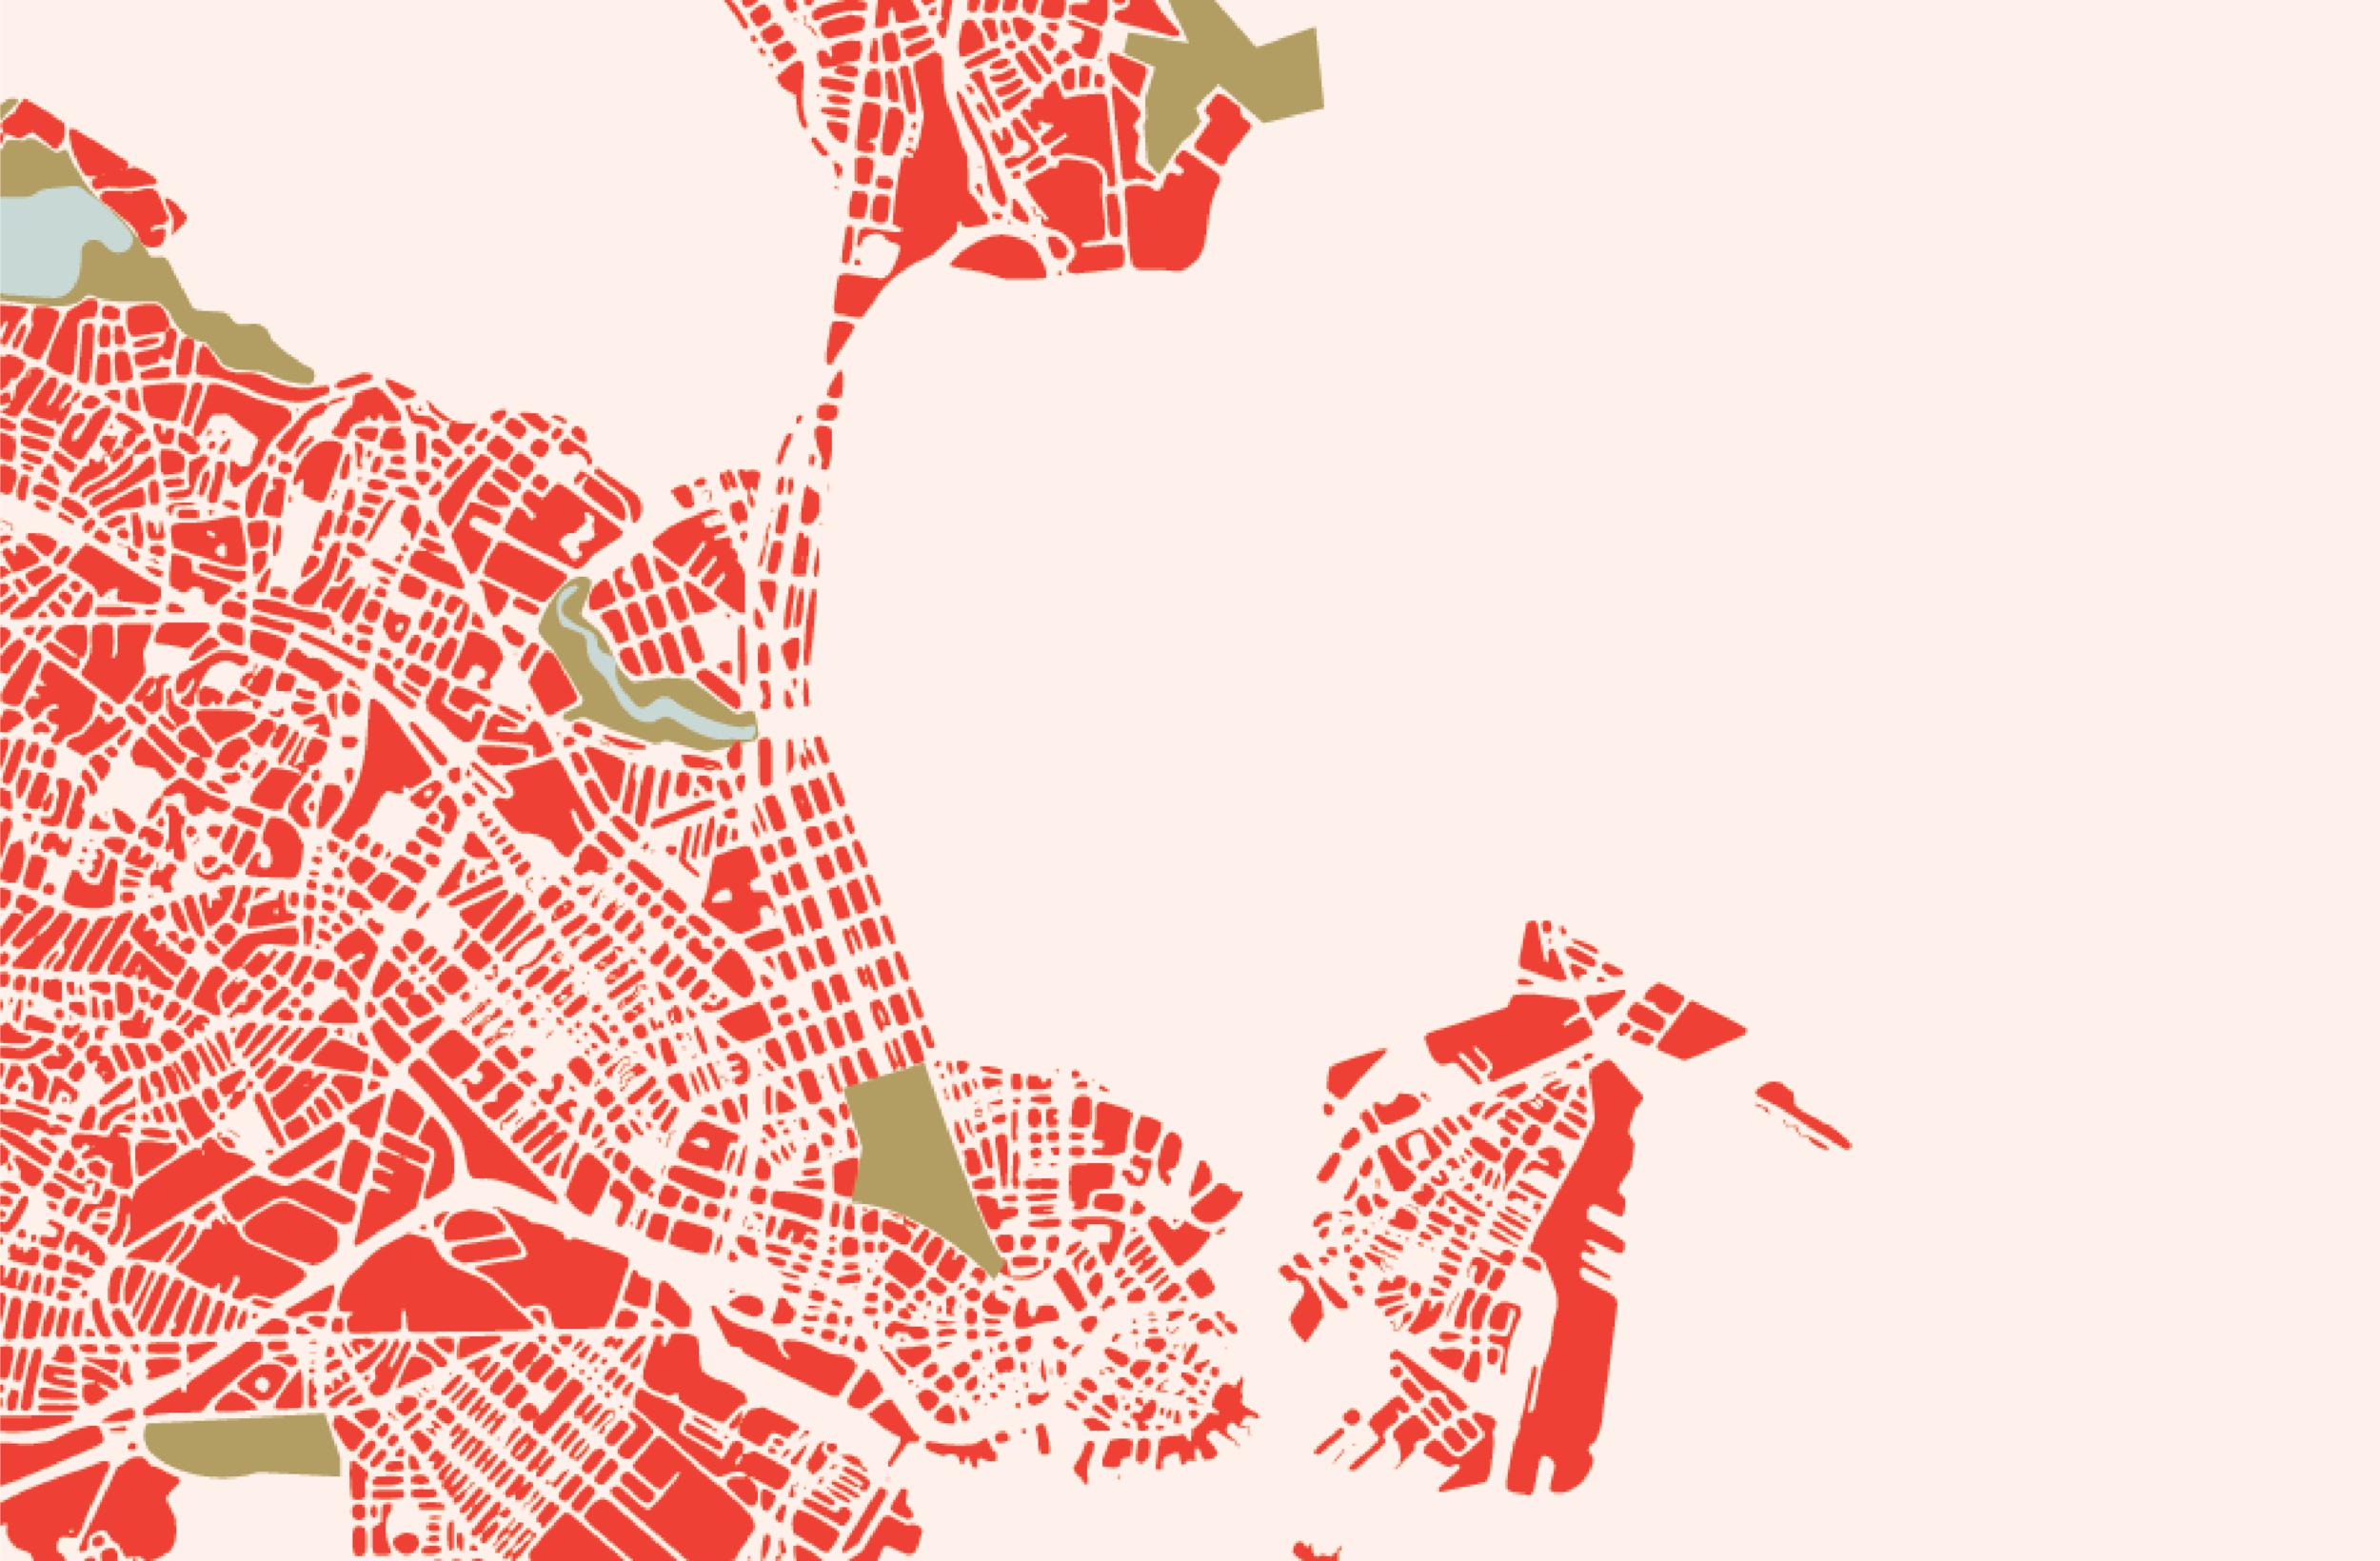 Welcome! - I'm a graphic designer on the North Shore of Boston, MA.